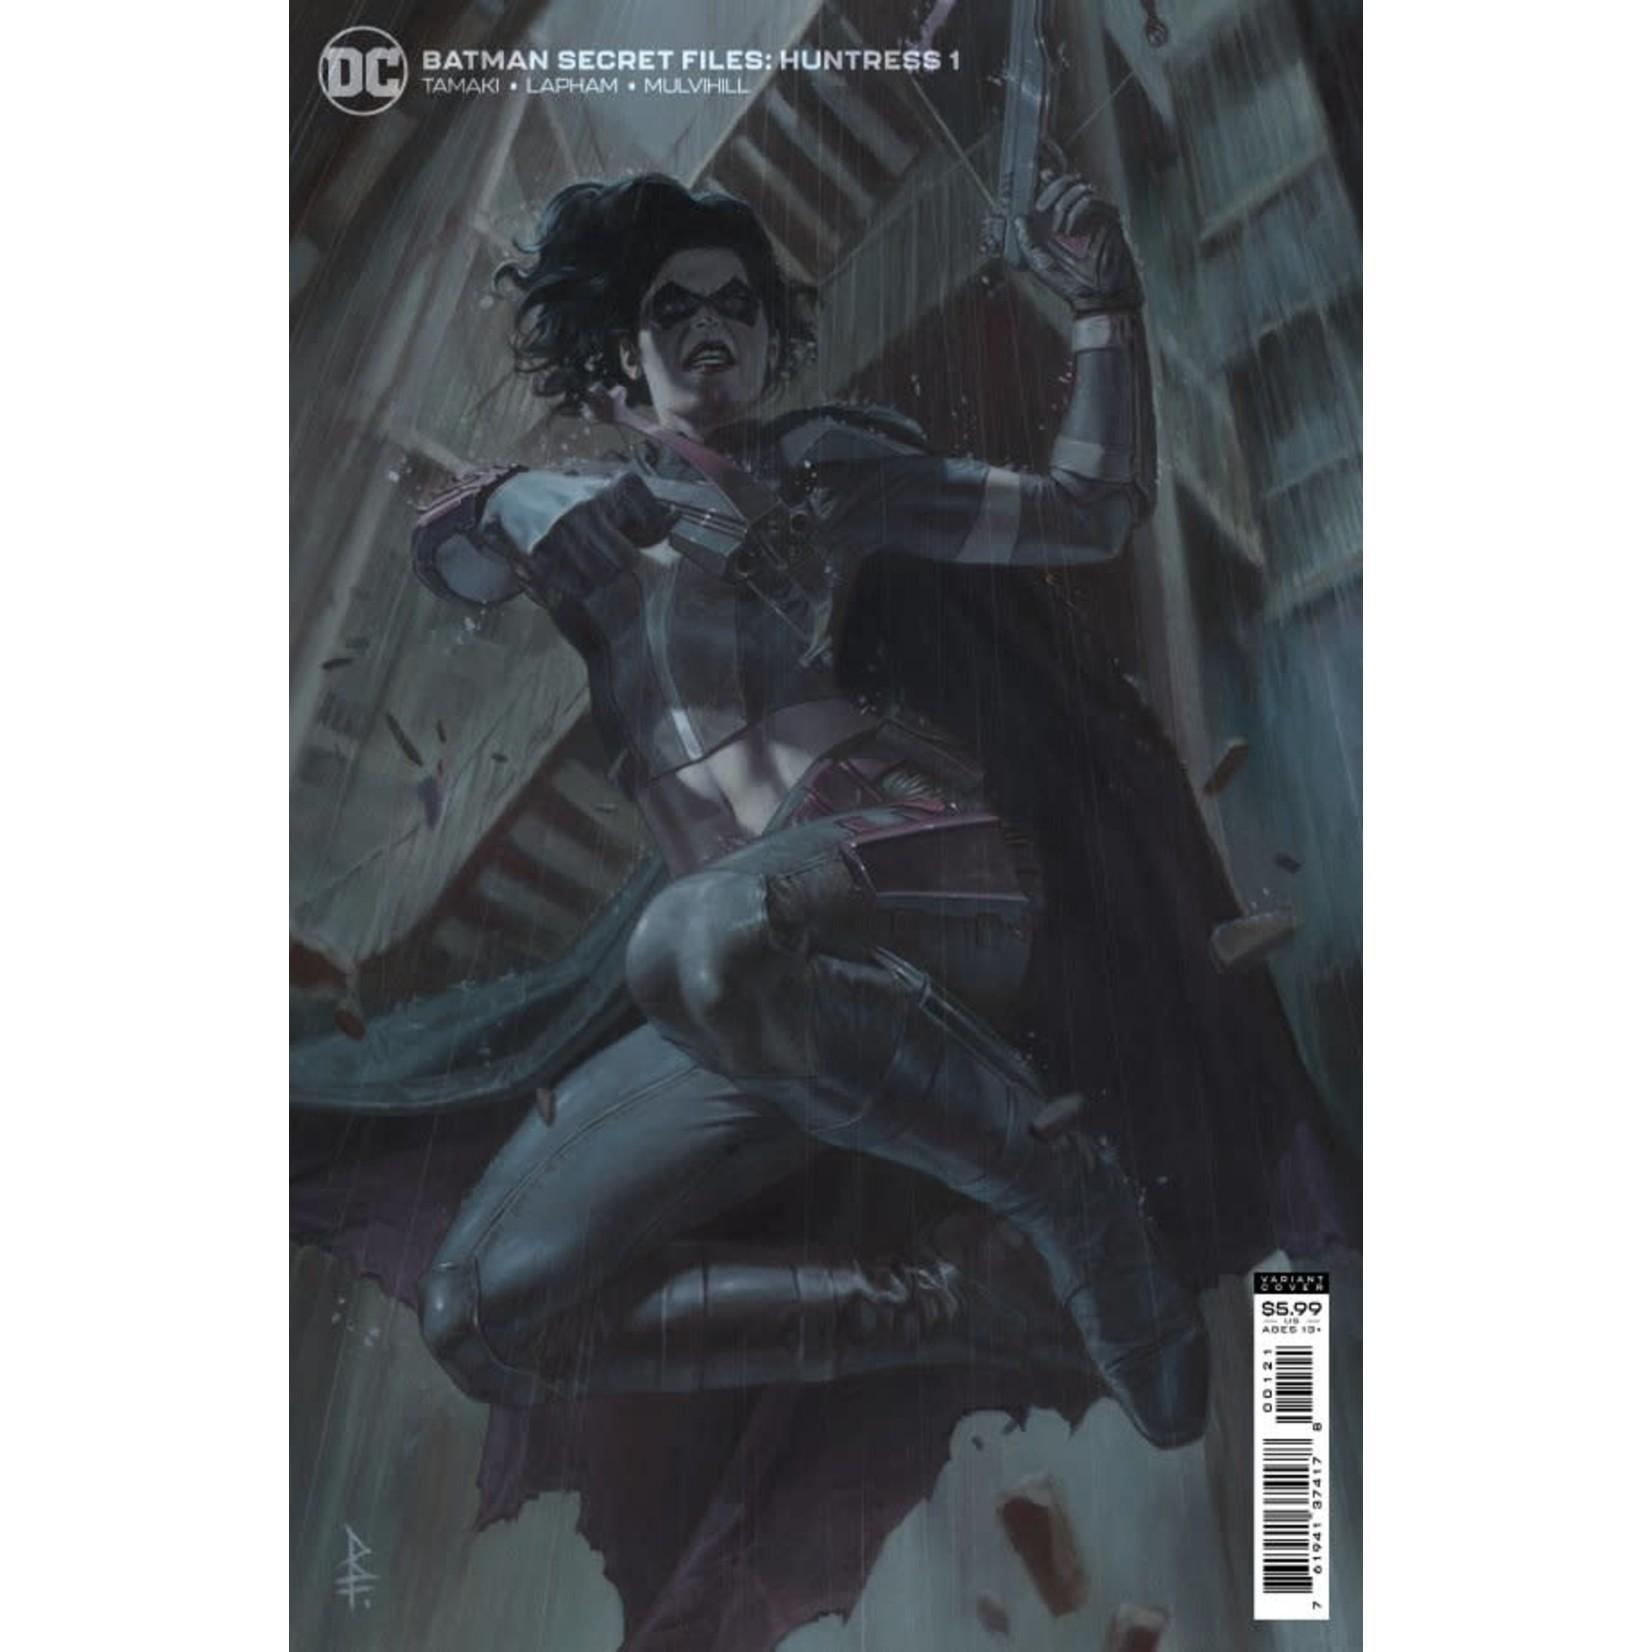 DC Comics Batman Secret Files: Huntress #1 Variant Cover By Riccardo Federici